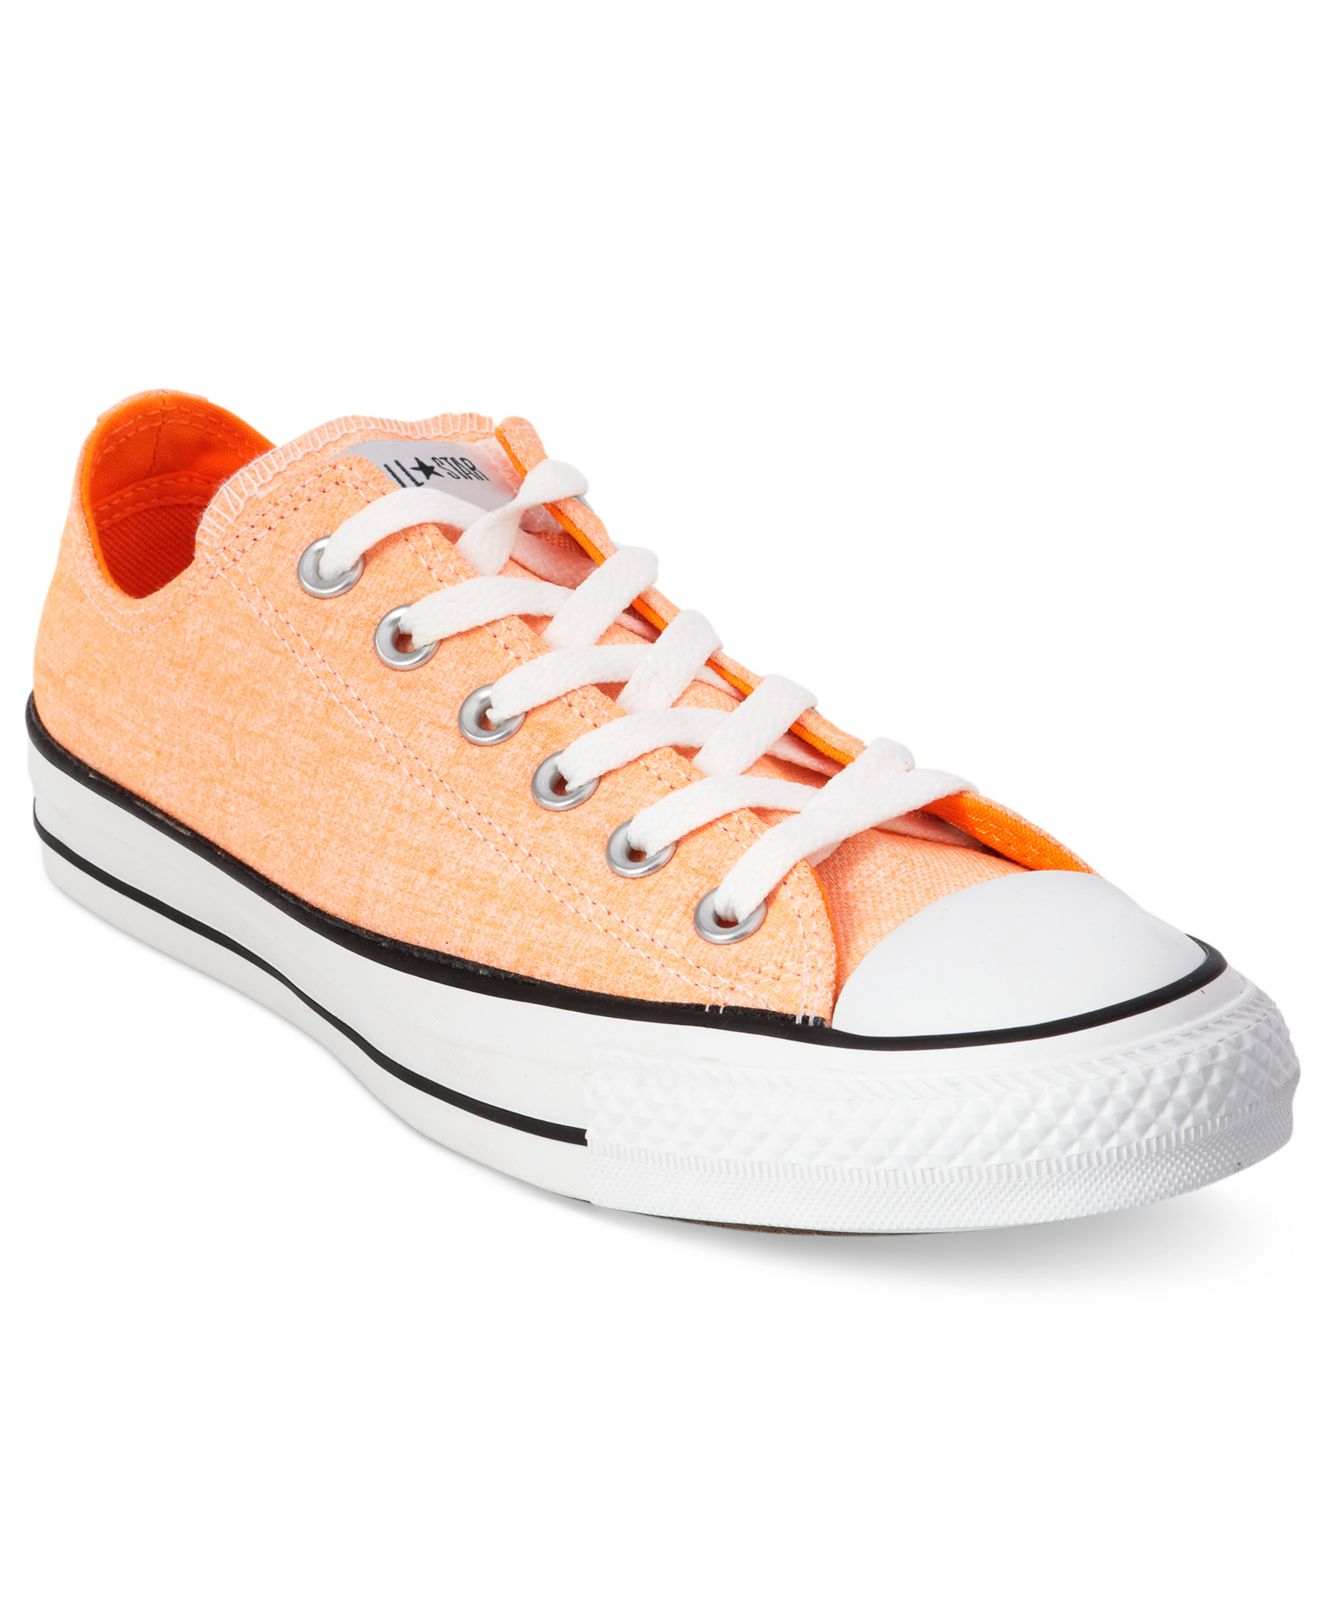 e760fbe5932c Lyst - Converse Women S Chuck Taylor All Star Seasonal Ox Sneakers ...